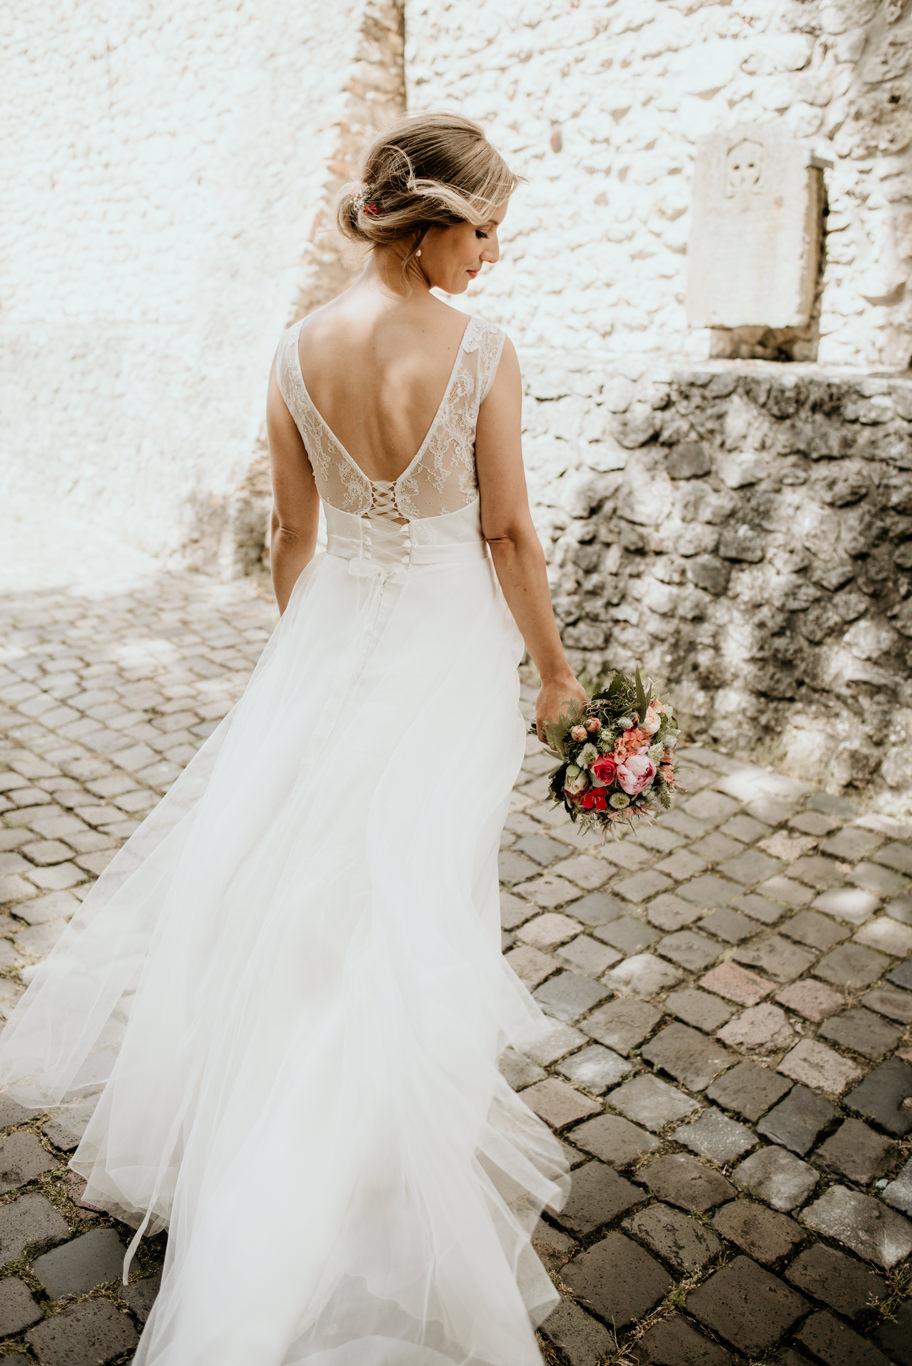 Hochzeitsfotograf Mannheim Braut Brautporträt Westhofen Worms Fine Art Schlossgut Lüll